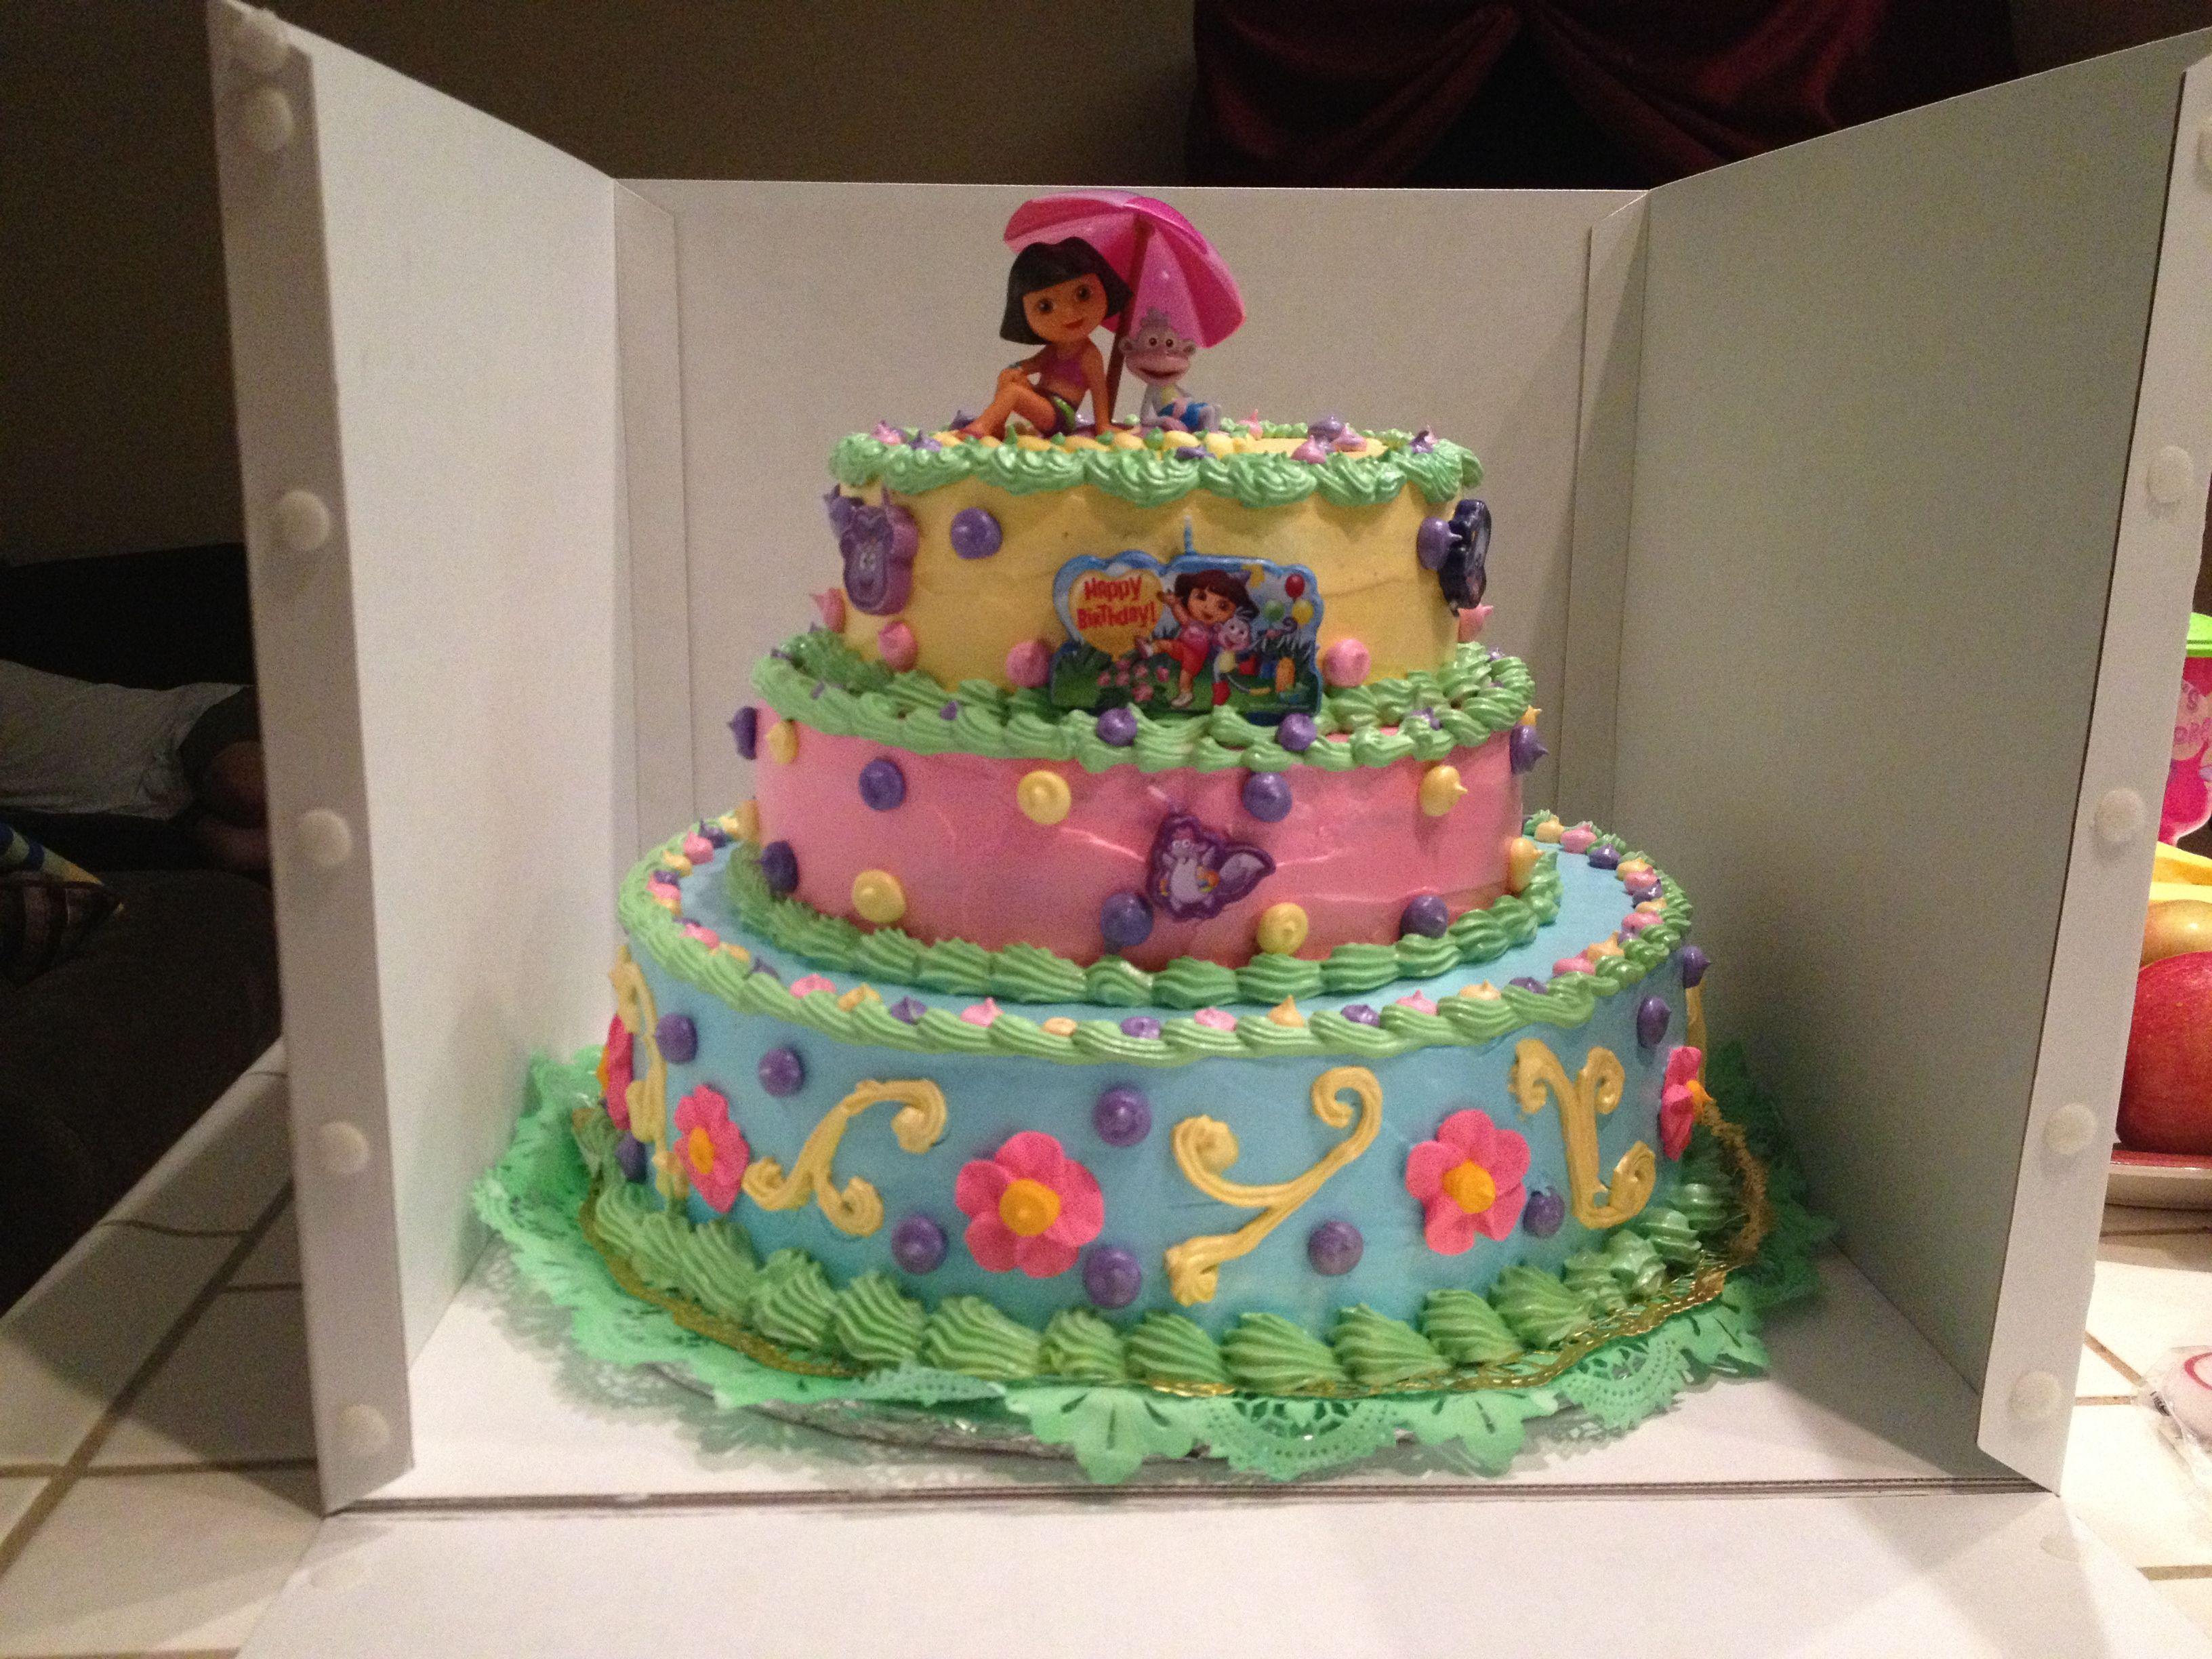 Elmo cake for 2 year old | Cakes | Pinterest | Elmo cake, Elmo and ...